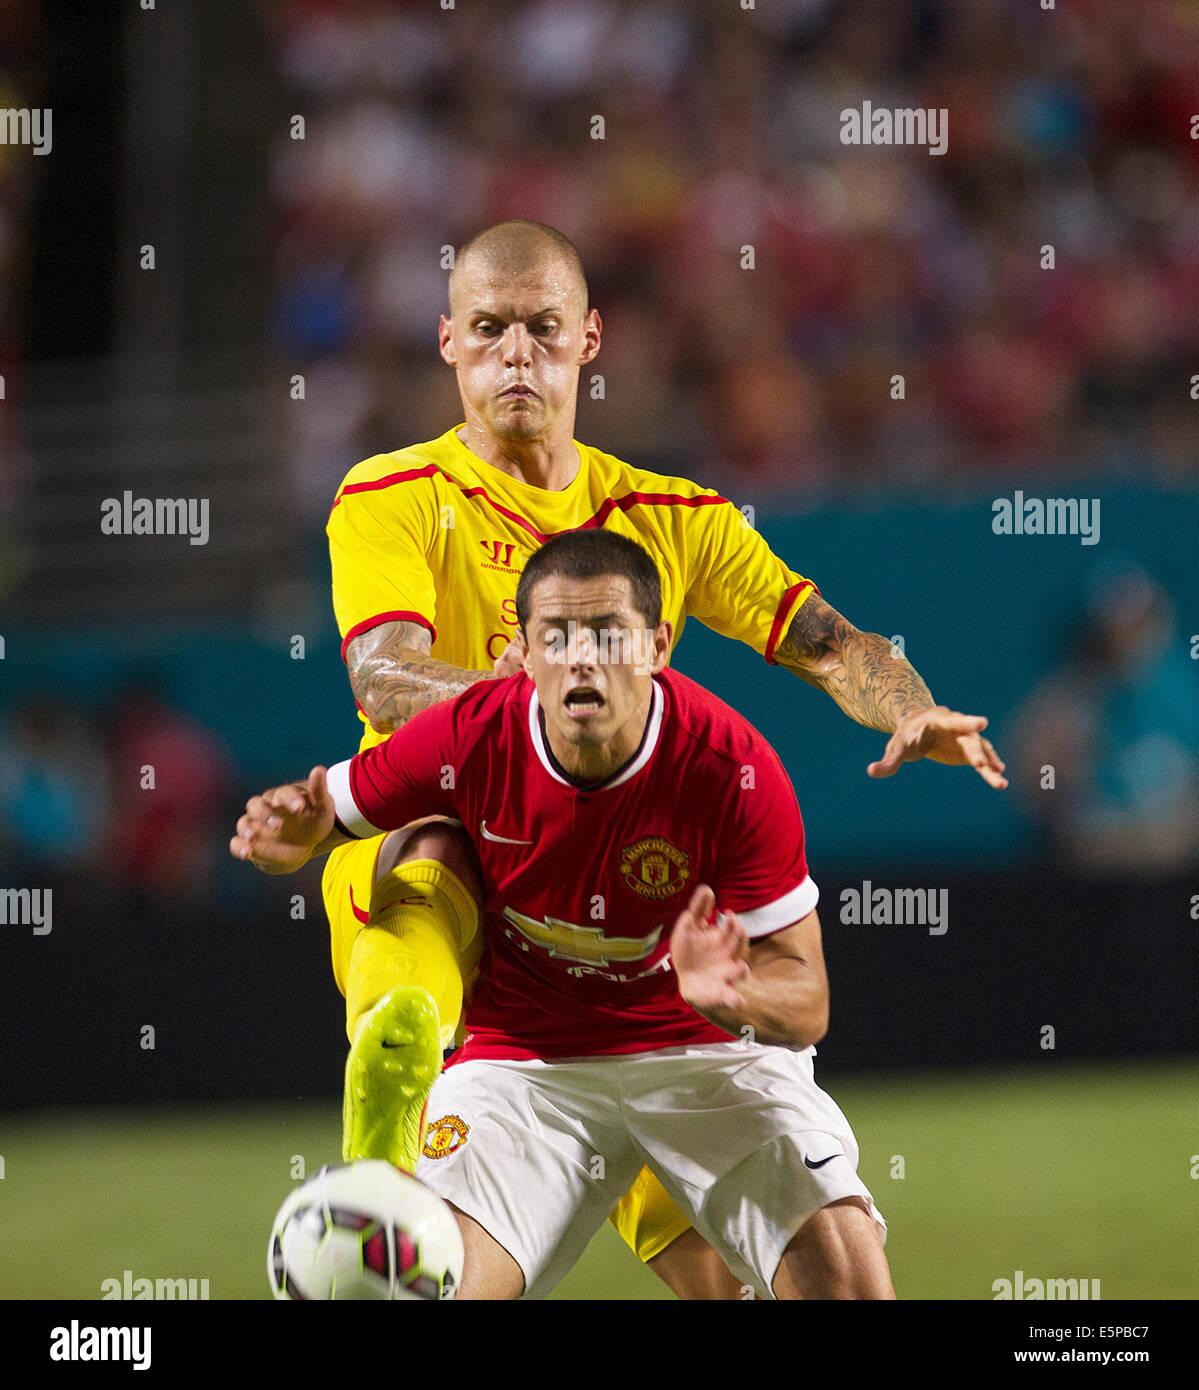 Liverpool Fc 4 0 Barcelona International Champions Cup: Javier Hernandez Stock Photos & Javier Hernandez Stock